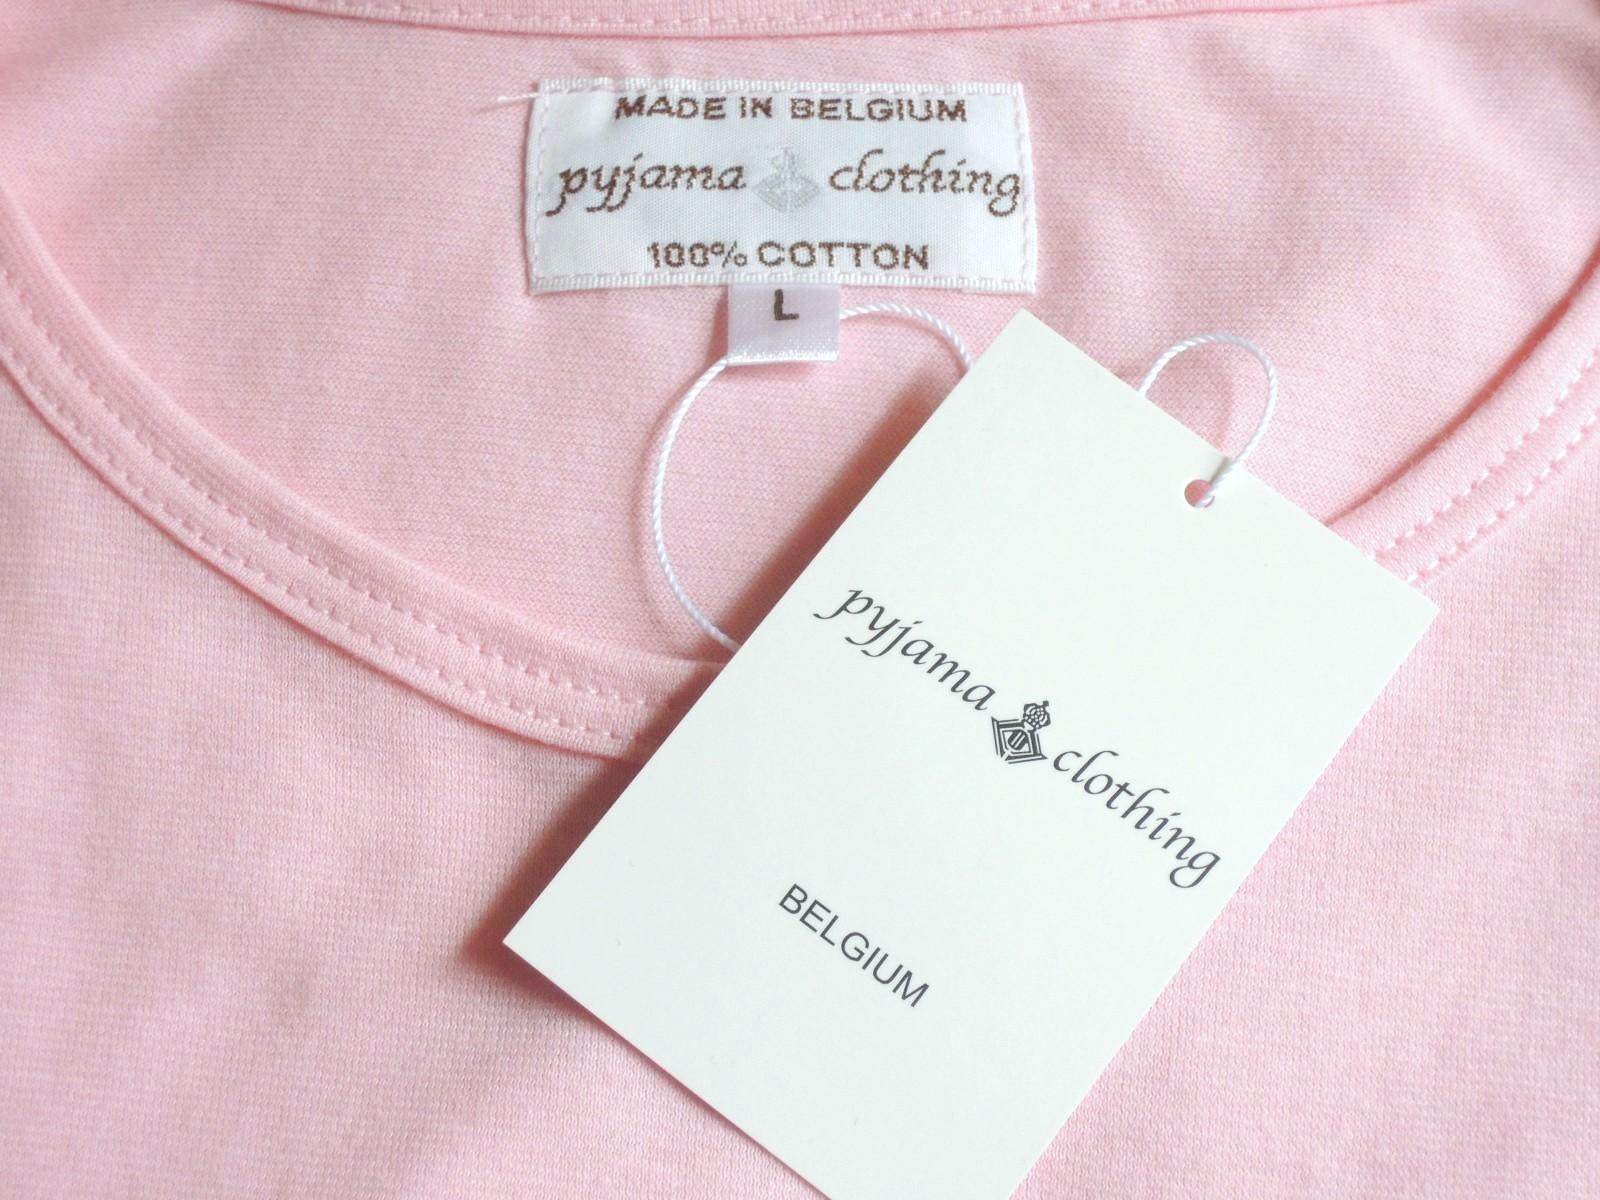 pyjamaclothingtshirts02.JPG